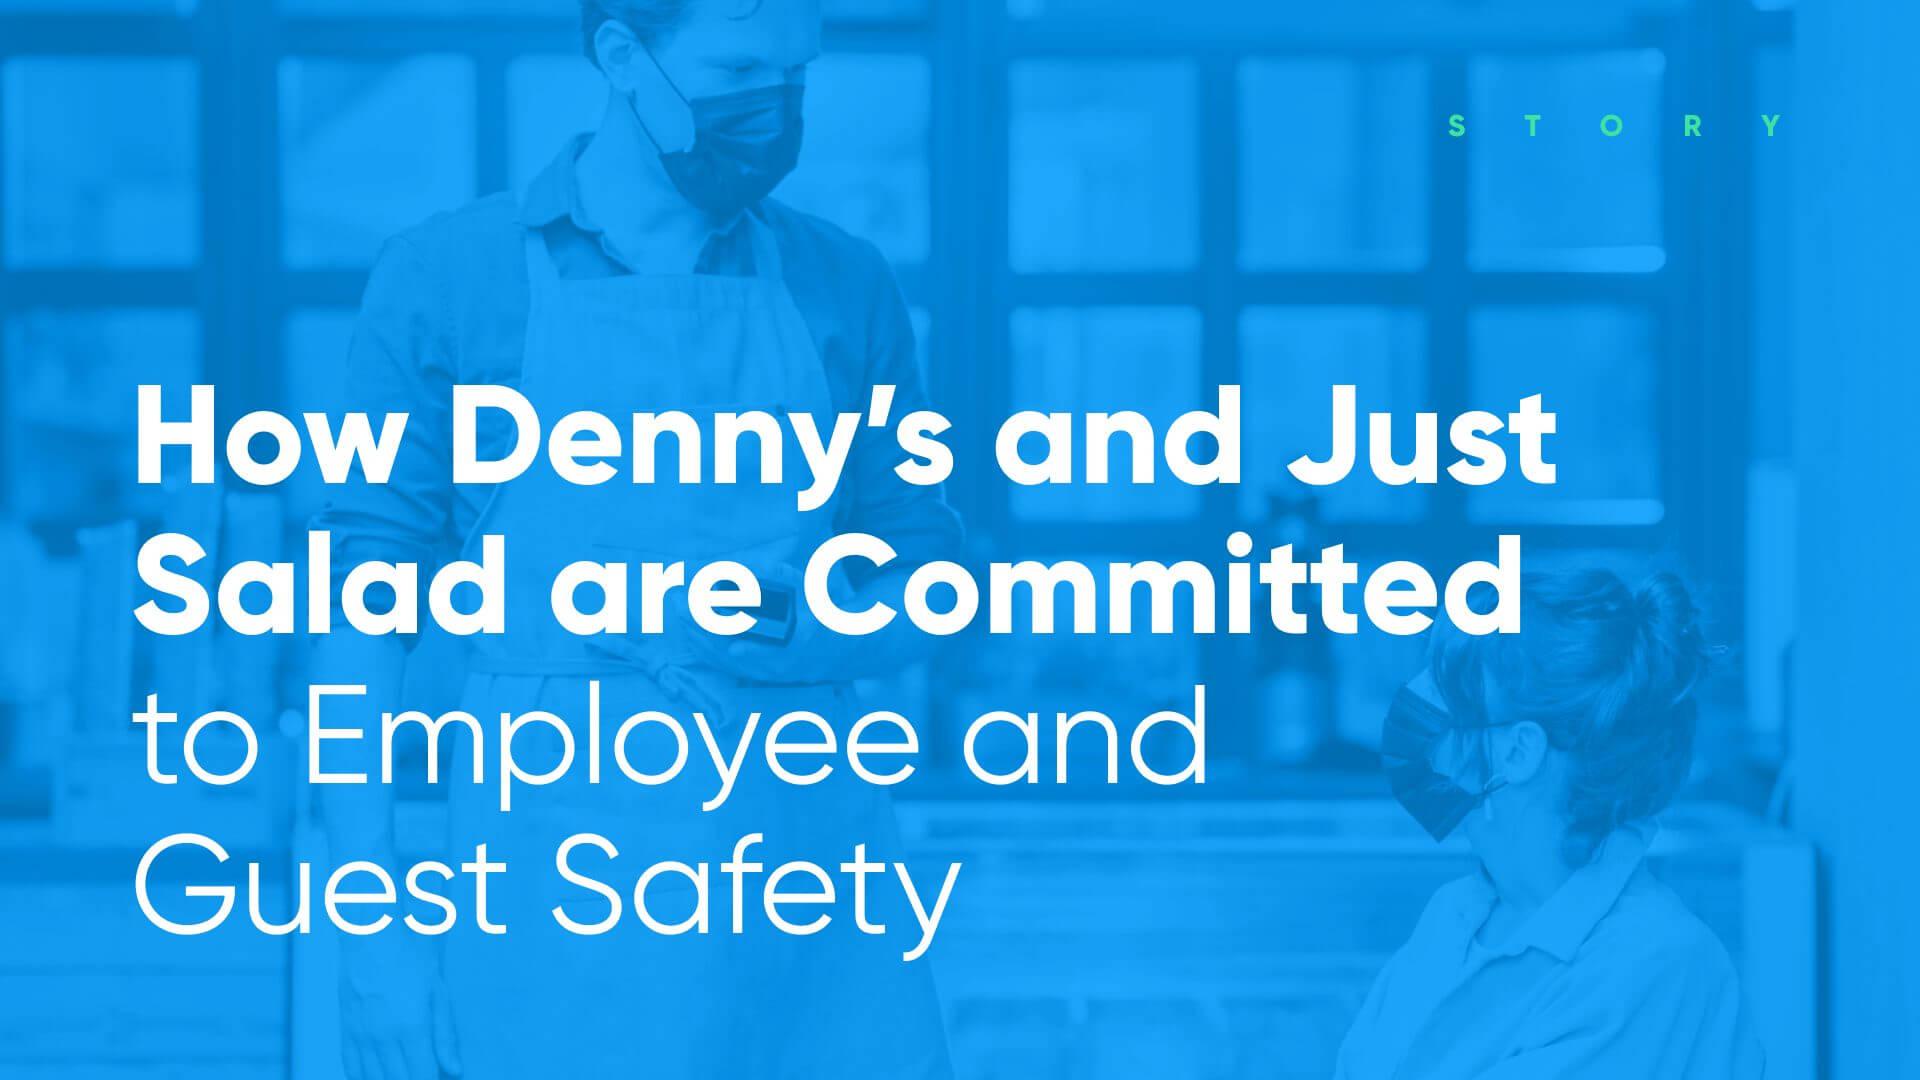 dennys and jsutsalad use employee health check software